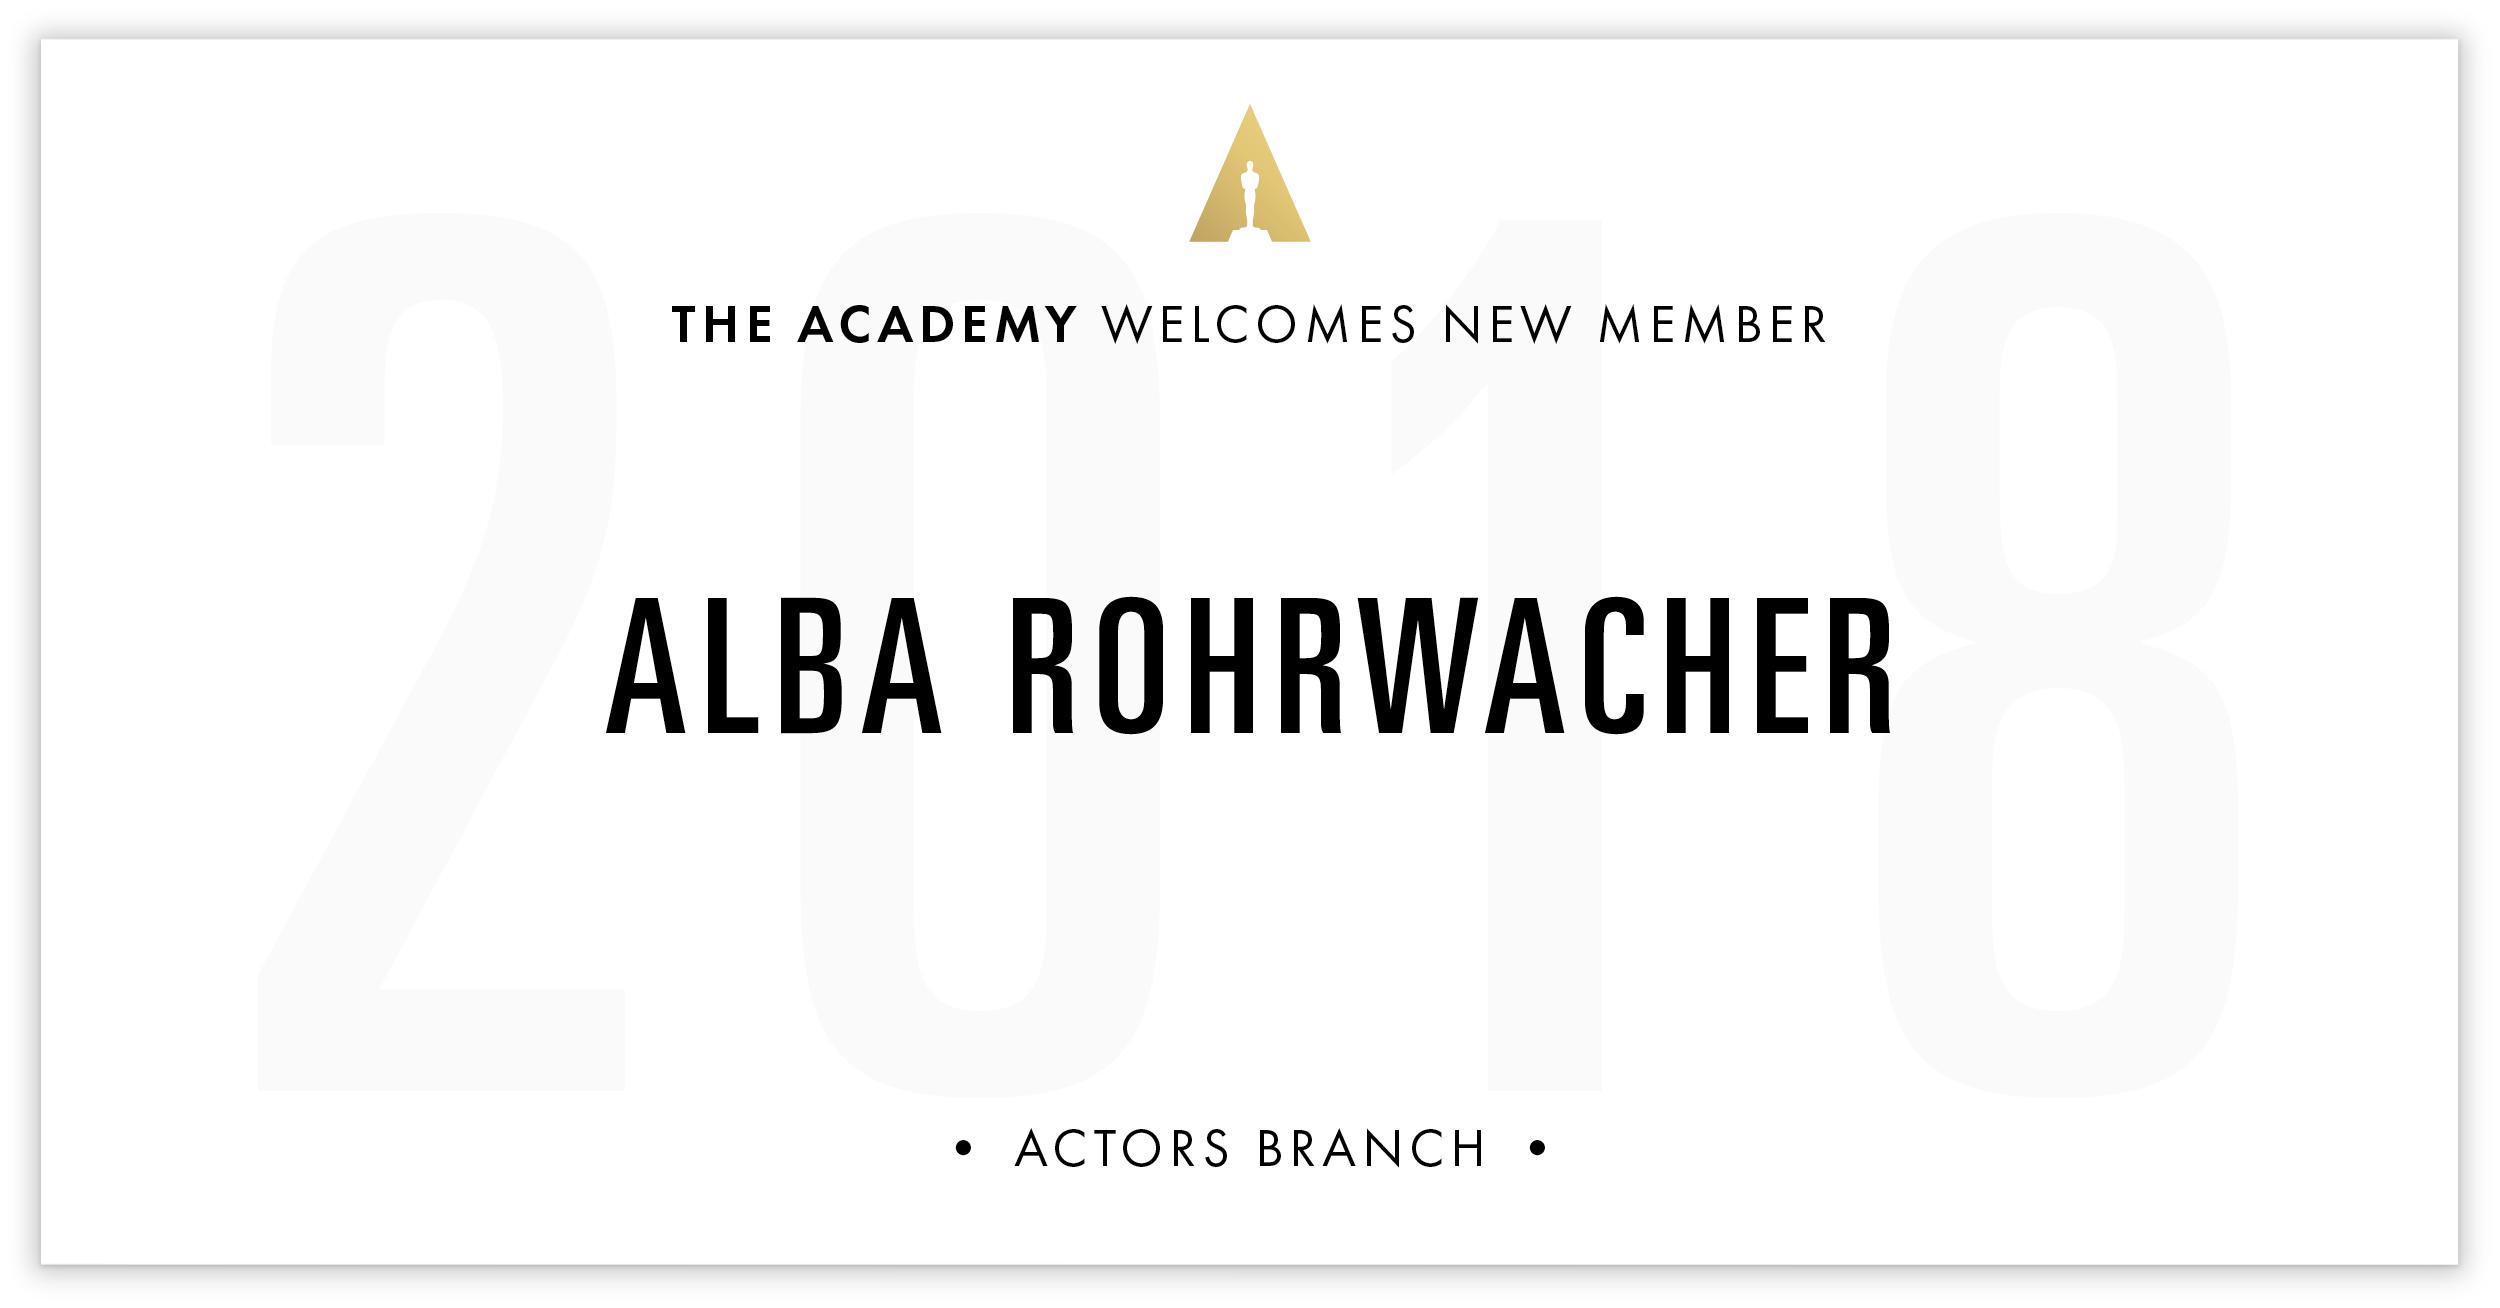 Alba Rohrwacher is invited!